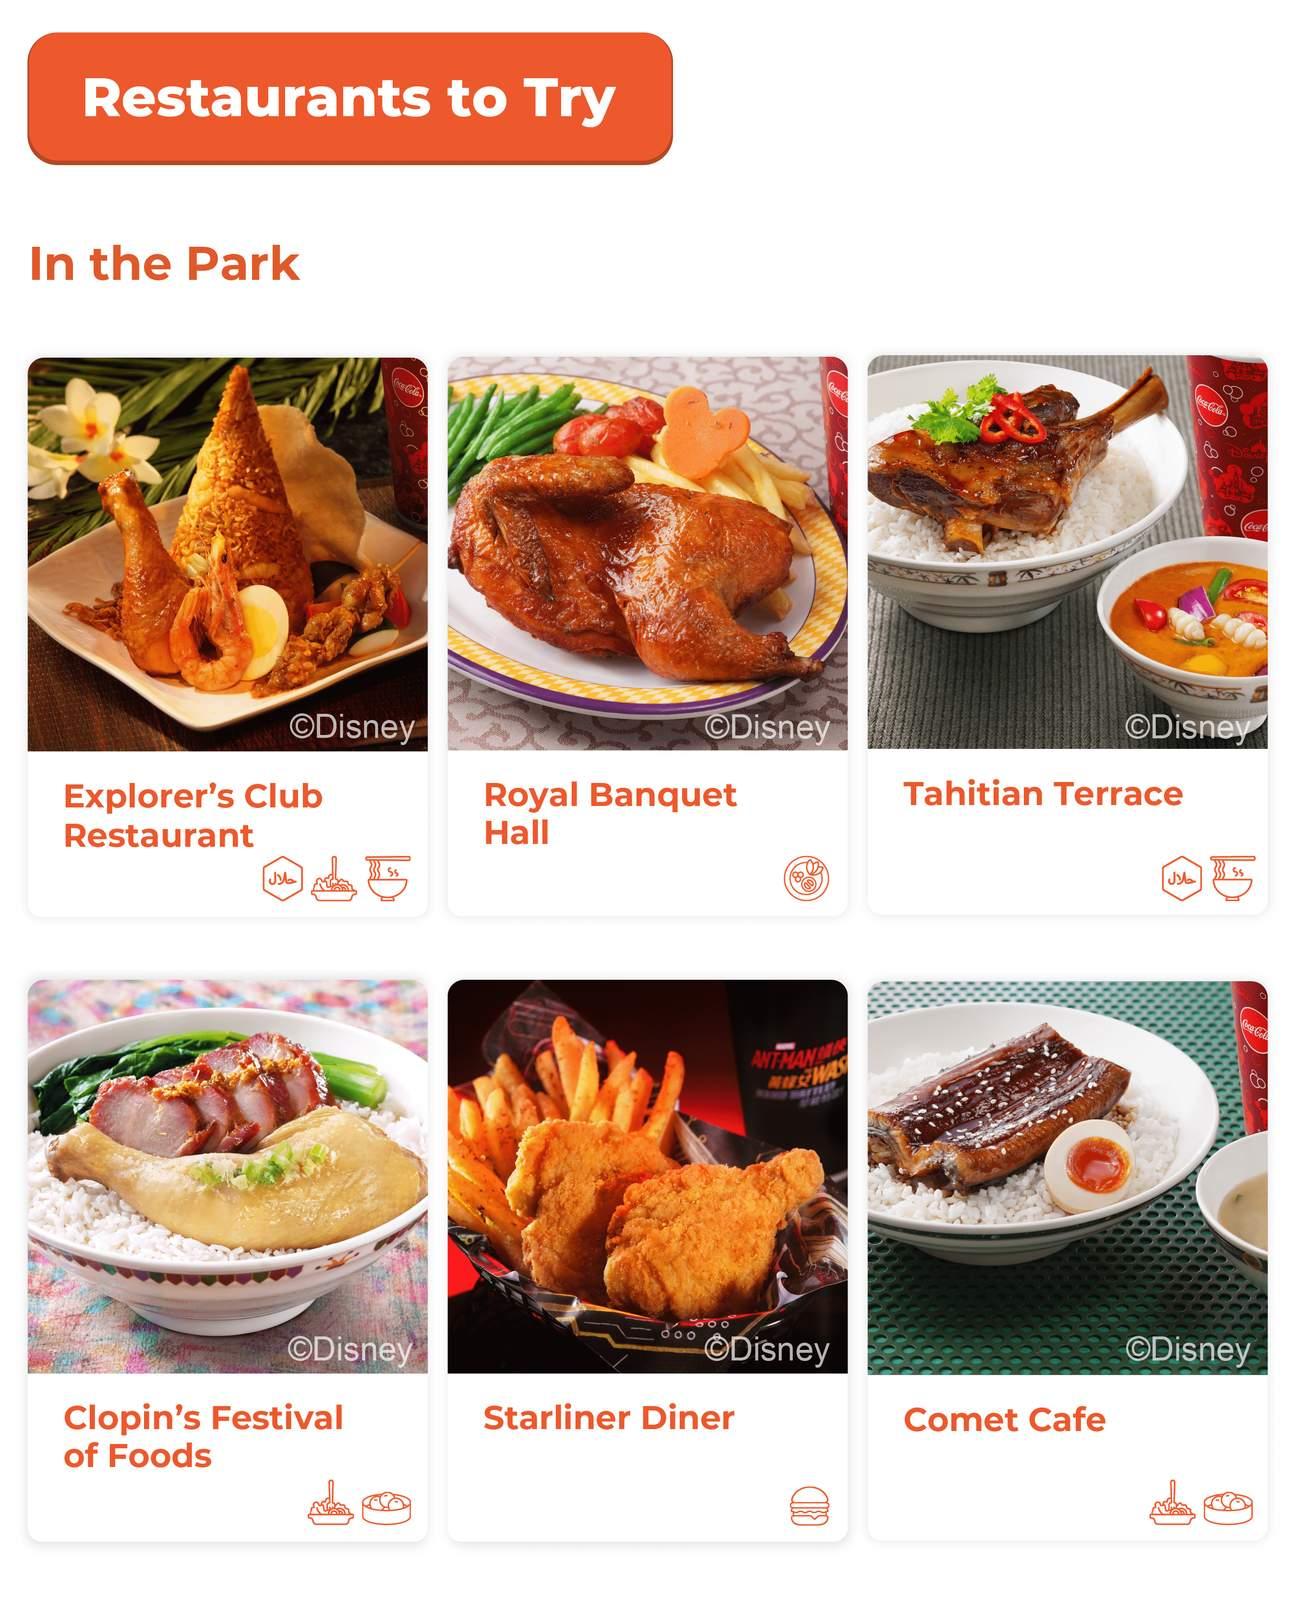 Restaurant in the Park